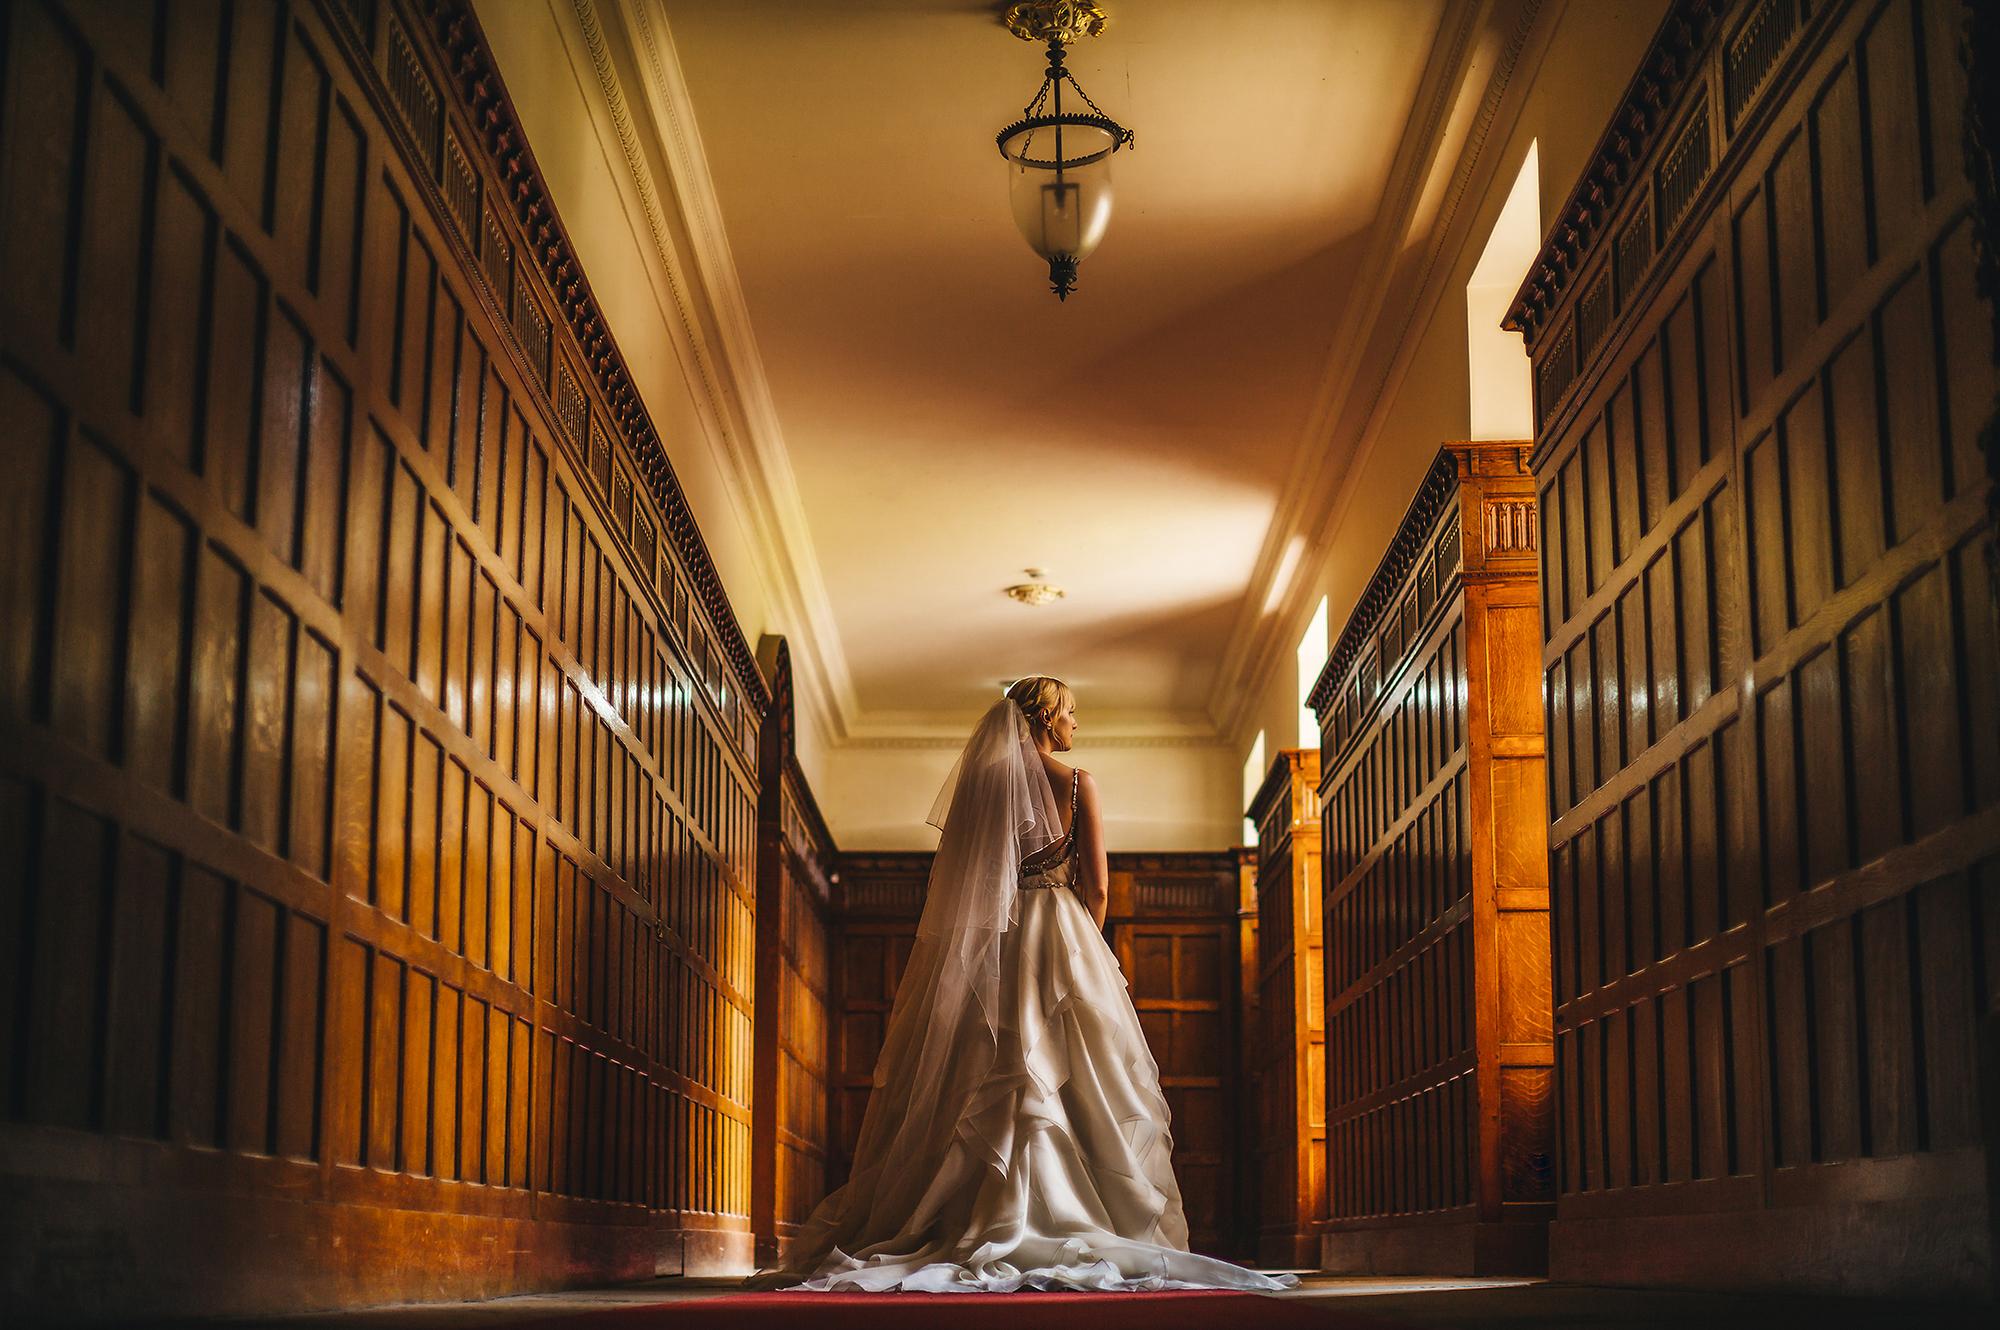 wentworth woodhouse wedding photographers yorkshire13.jpg